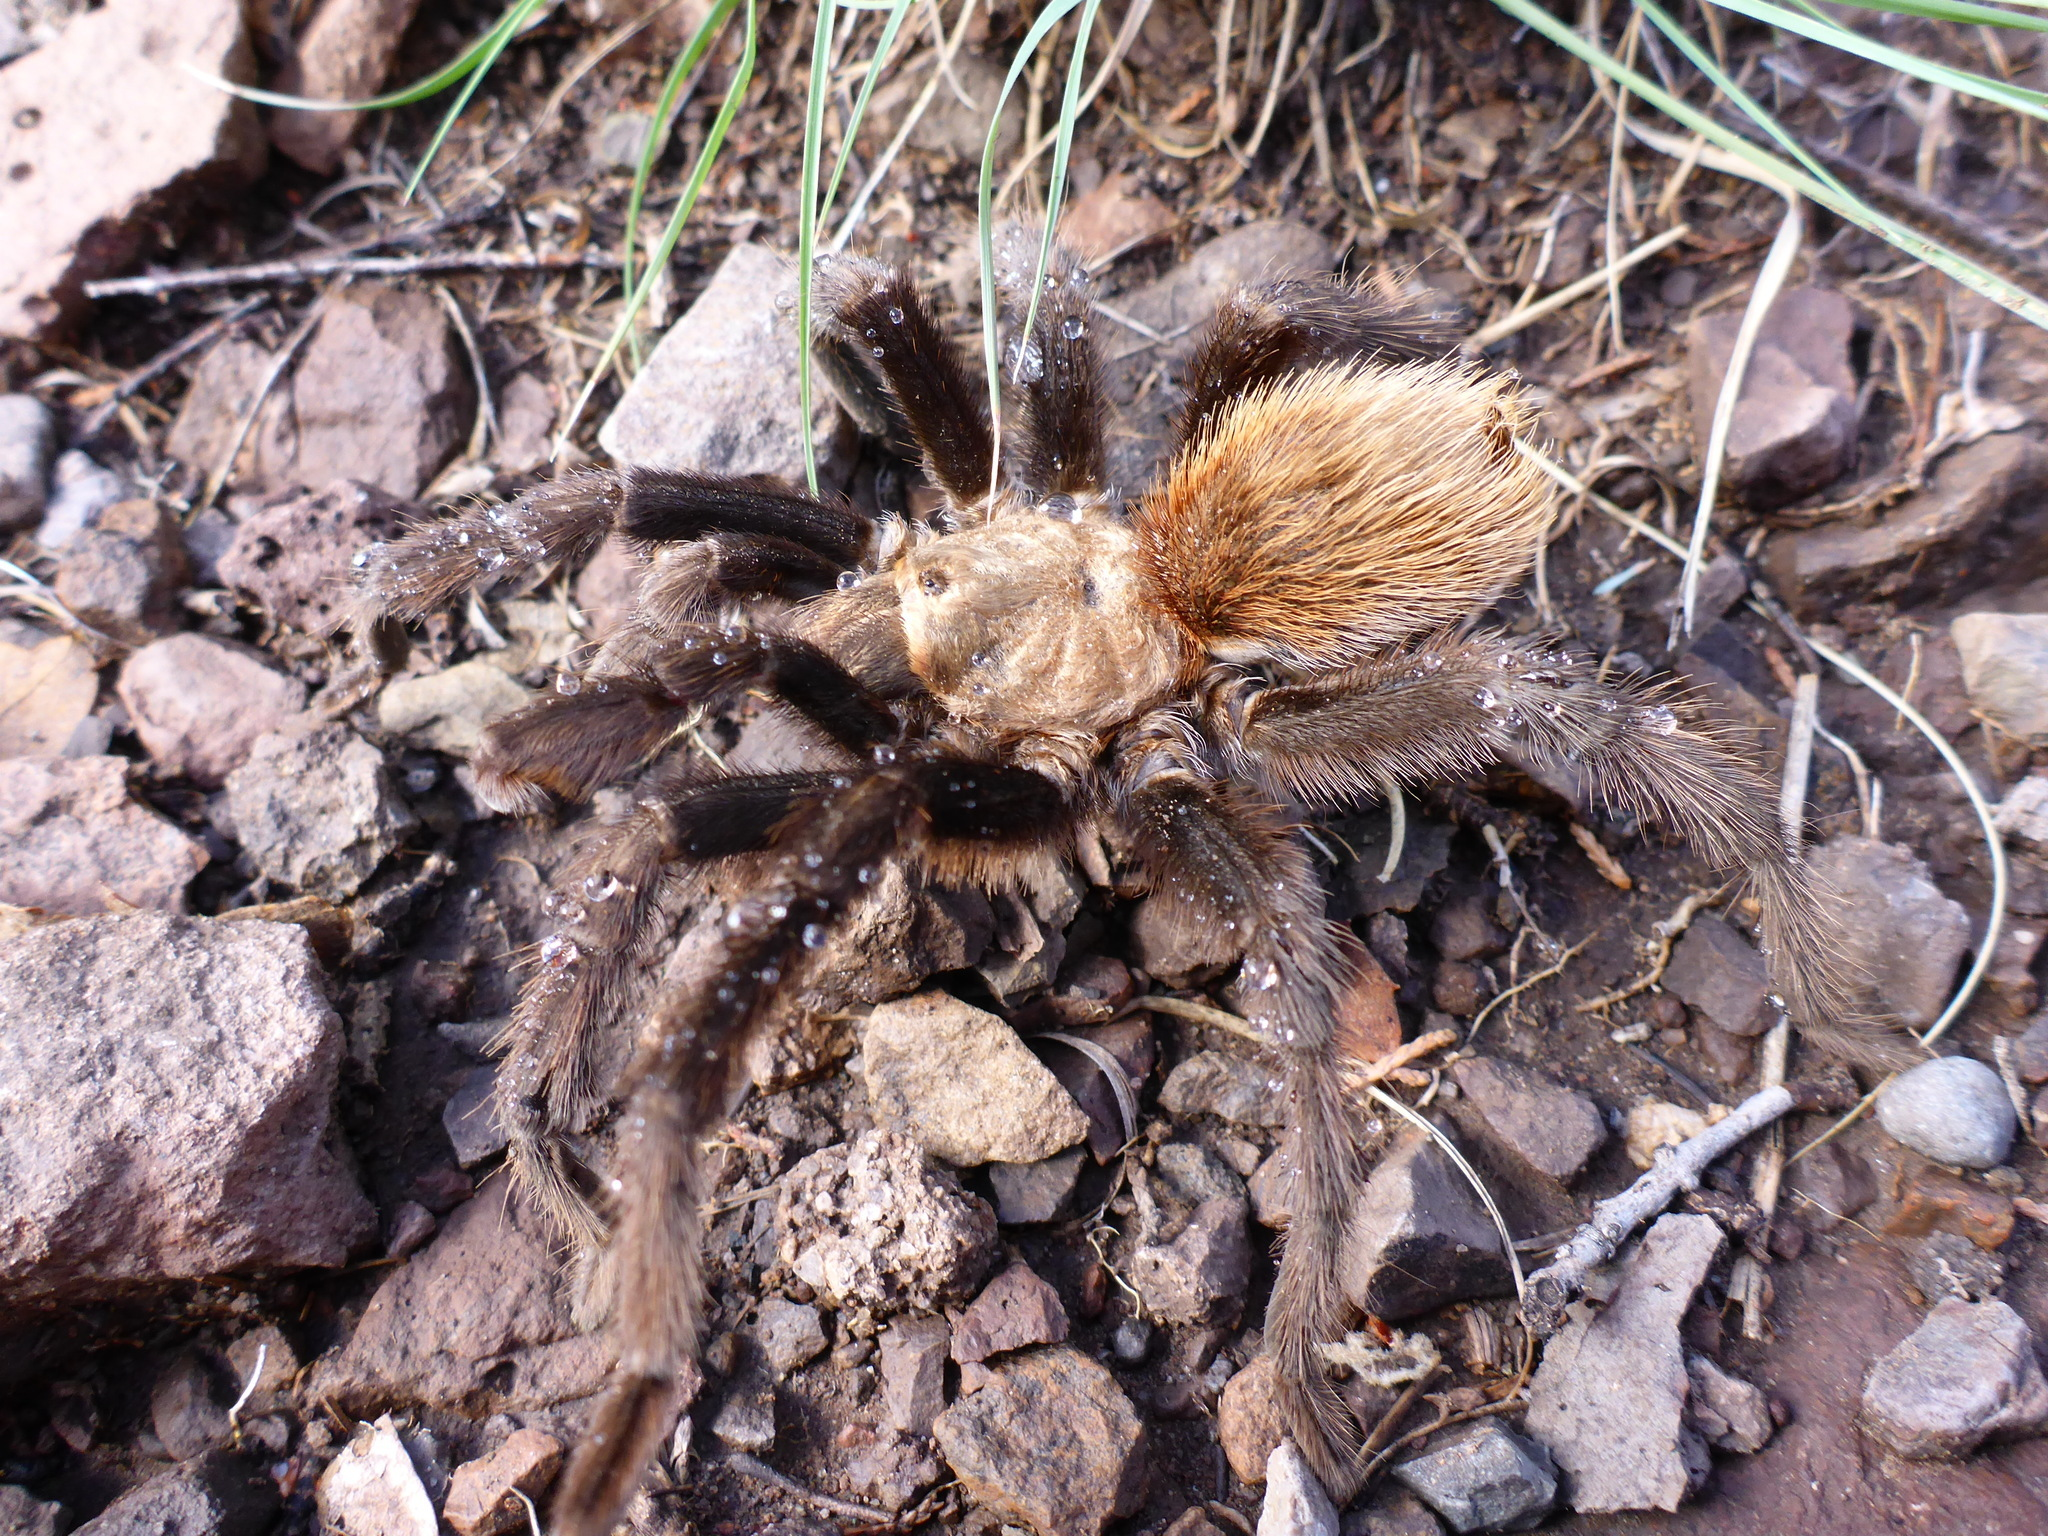 Image of Texas Brown Tarantula